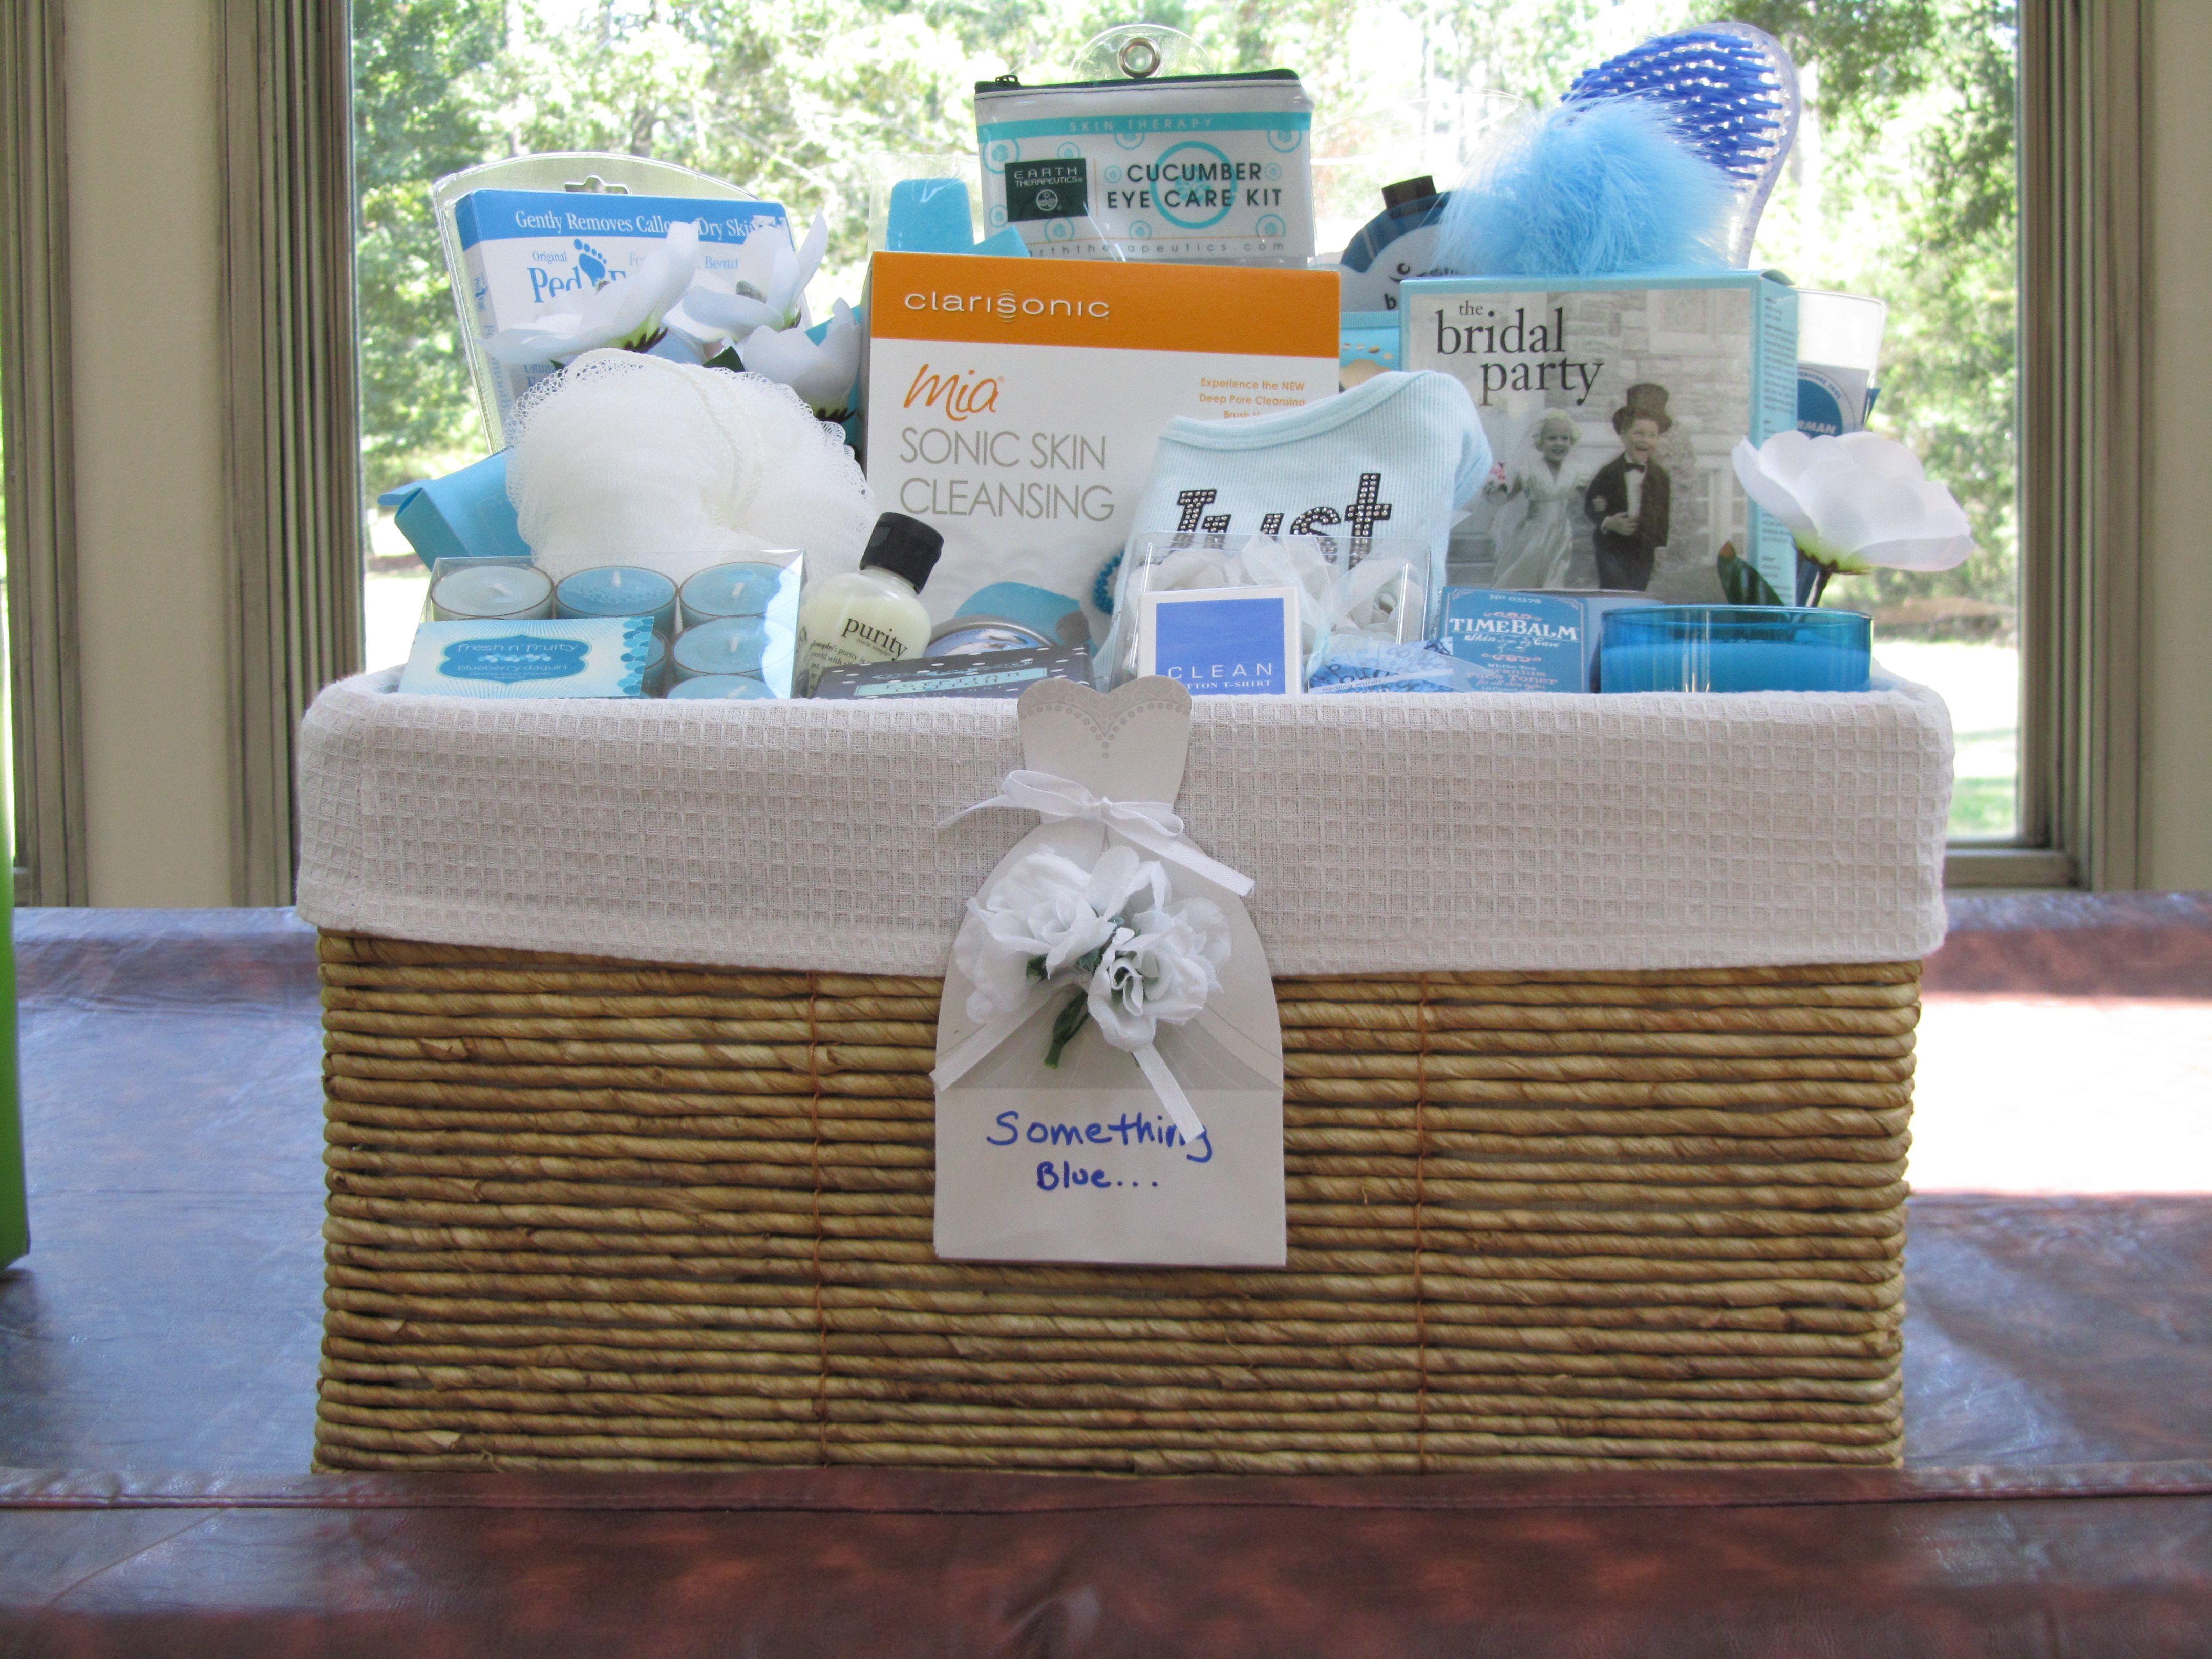 Something Blue Wedding Gift Basket Gift Baskets Pinterest